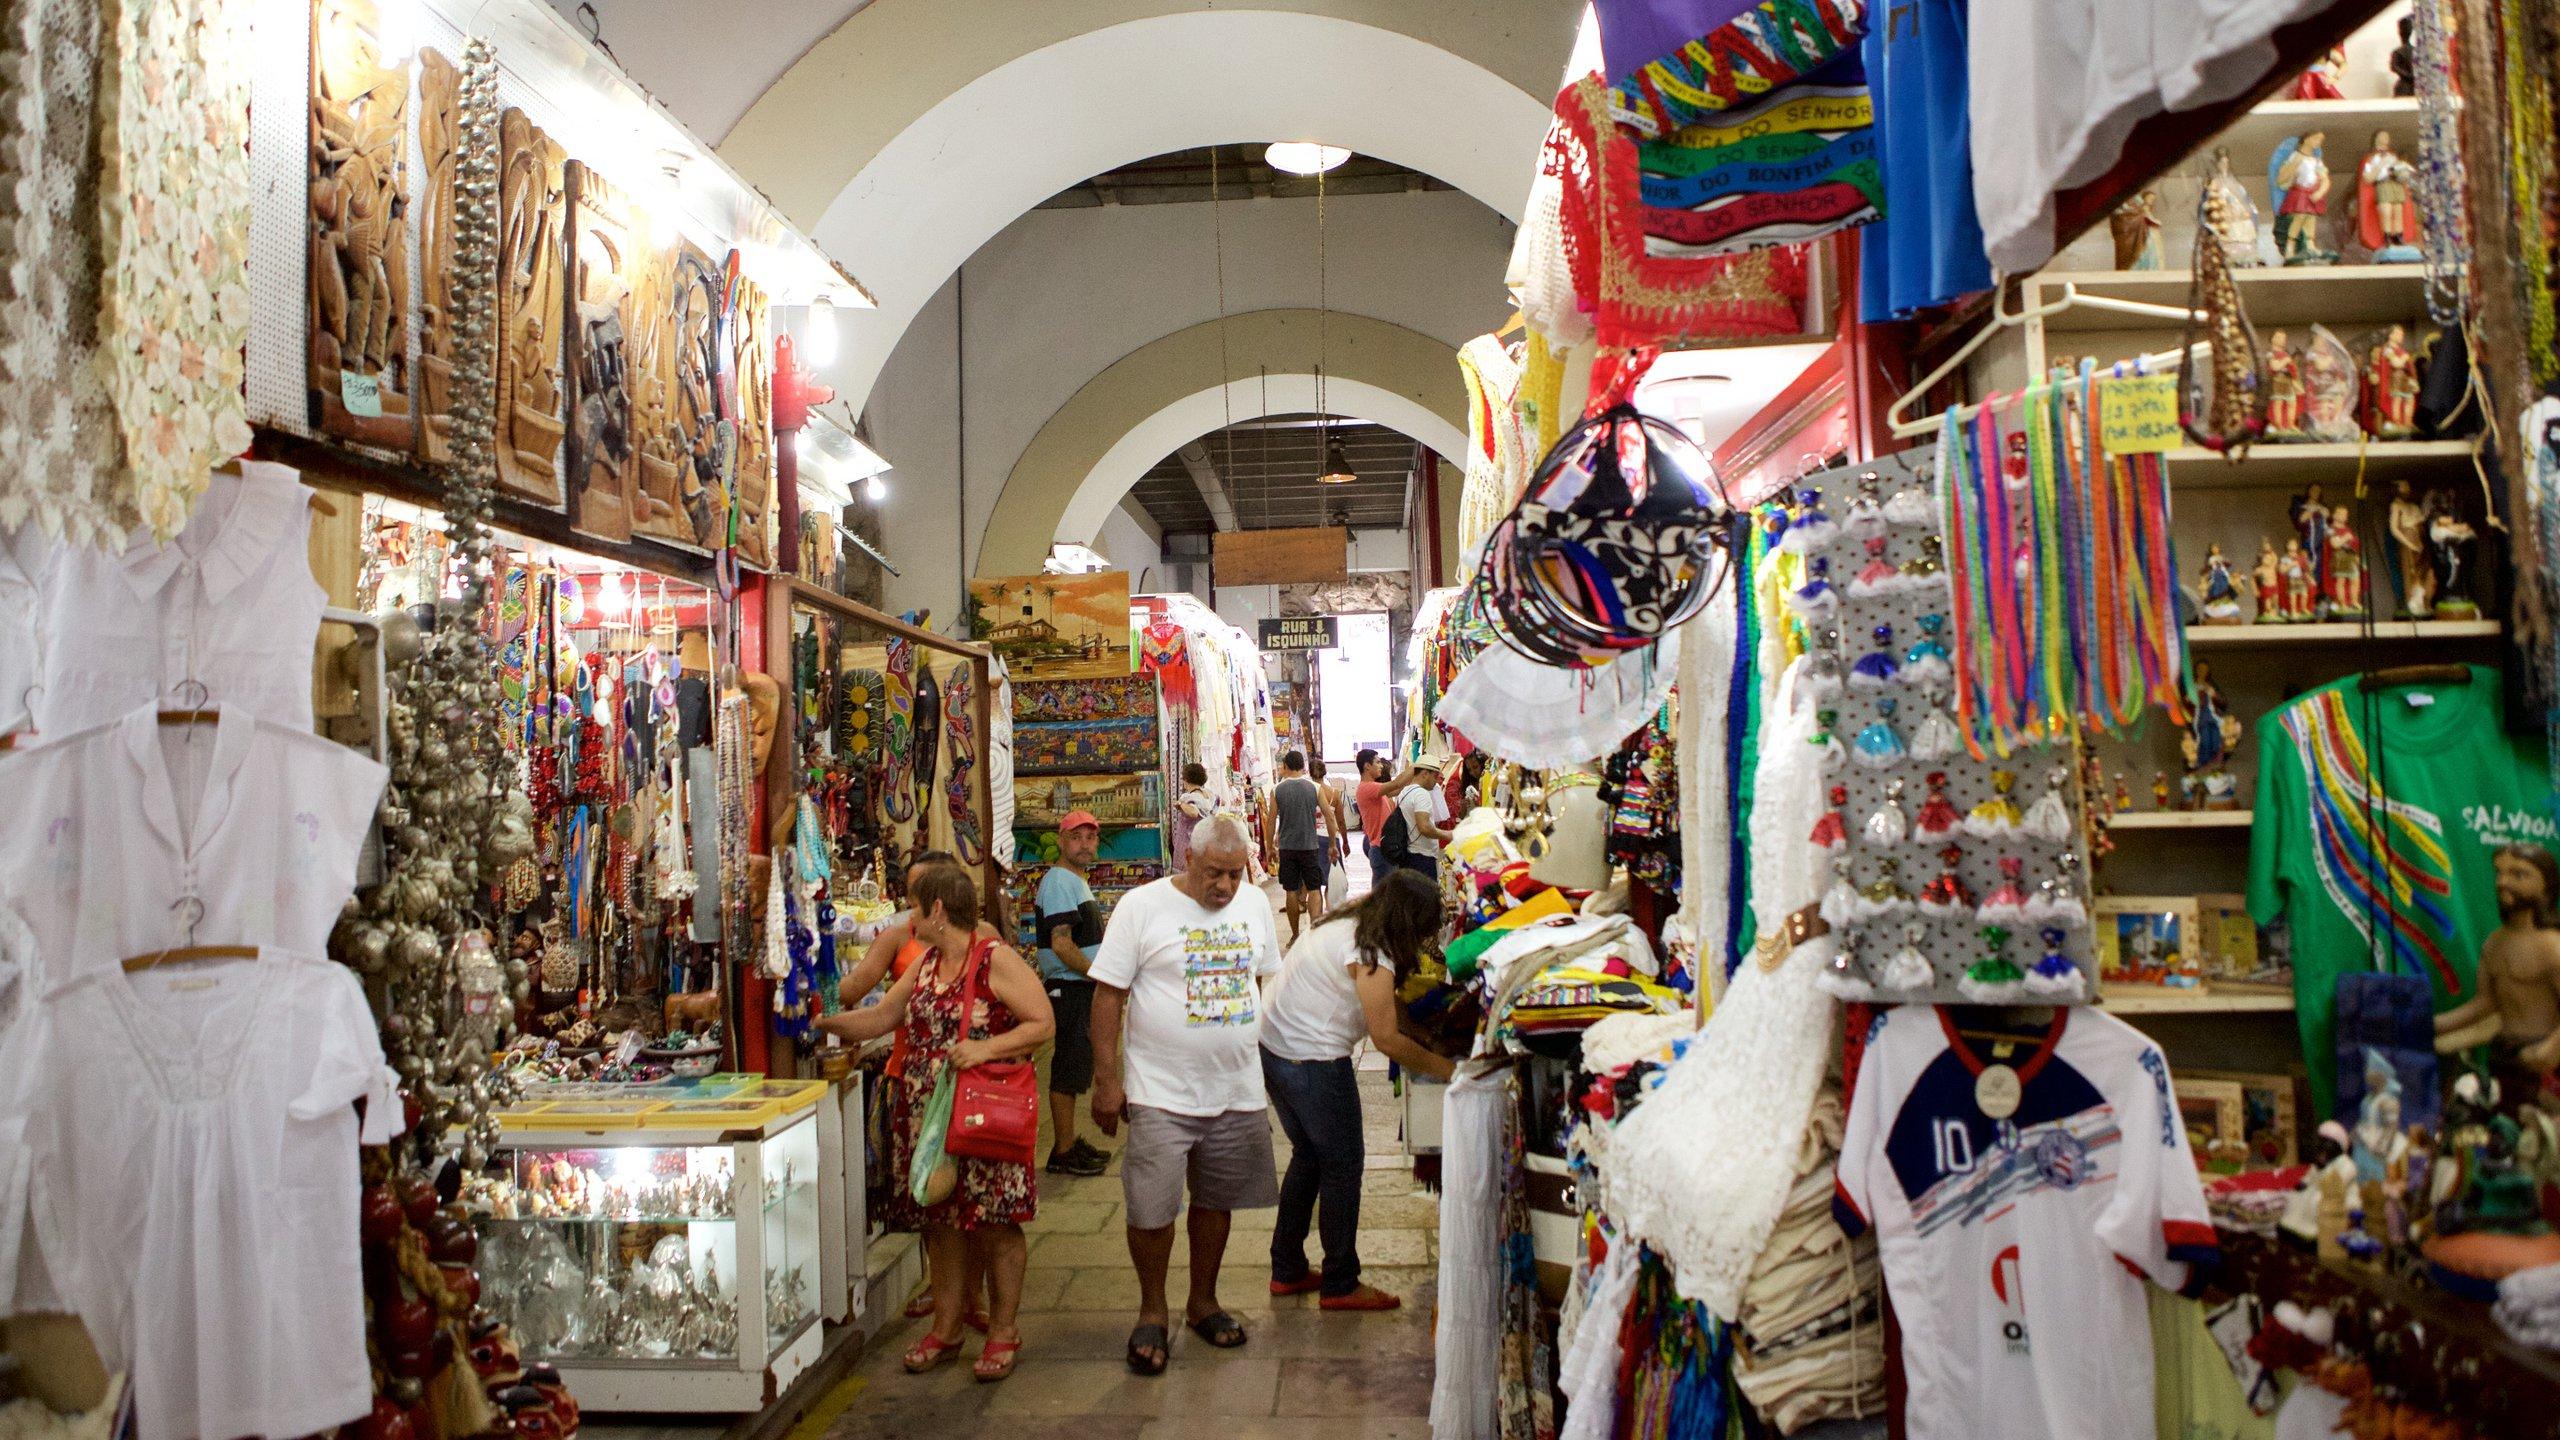 Comercio, Salvador, Bahia State, Brazil